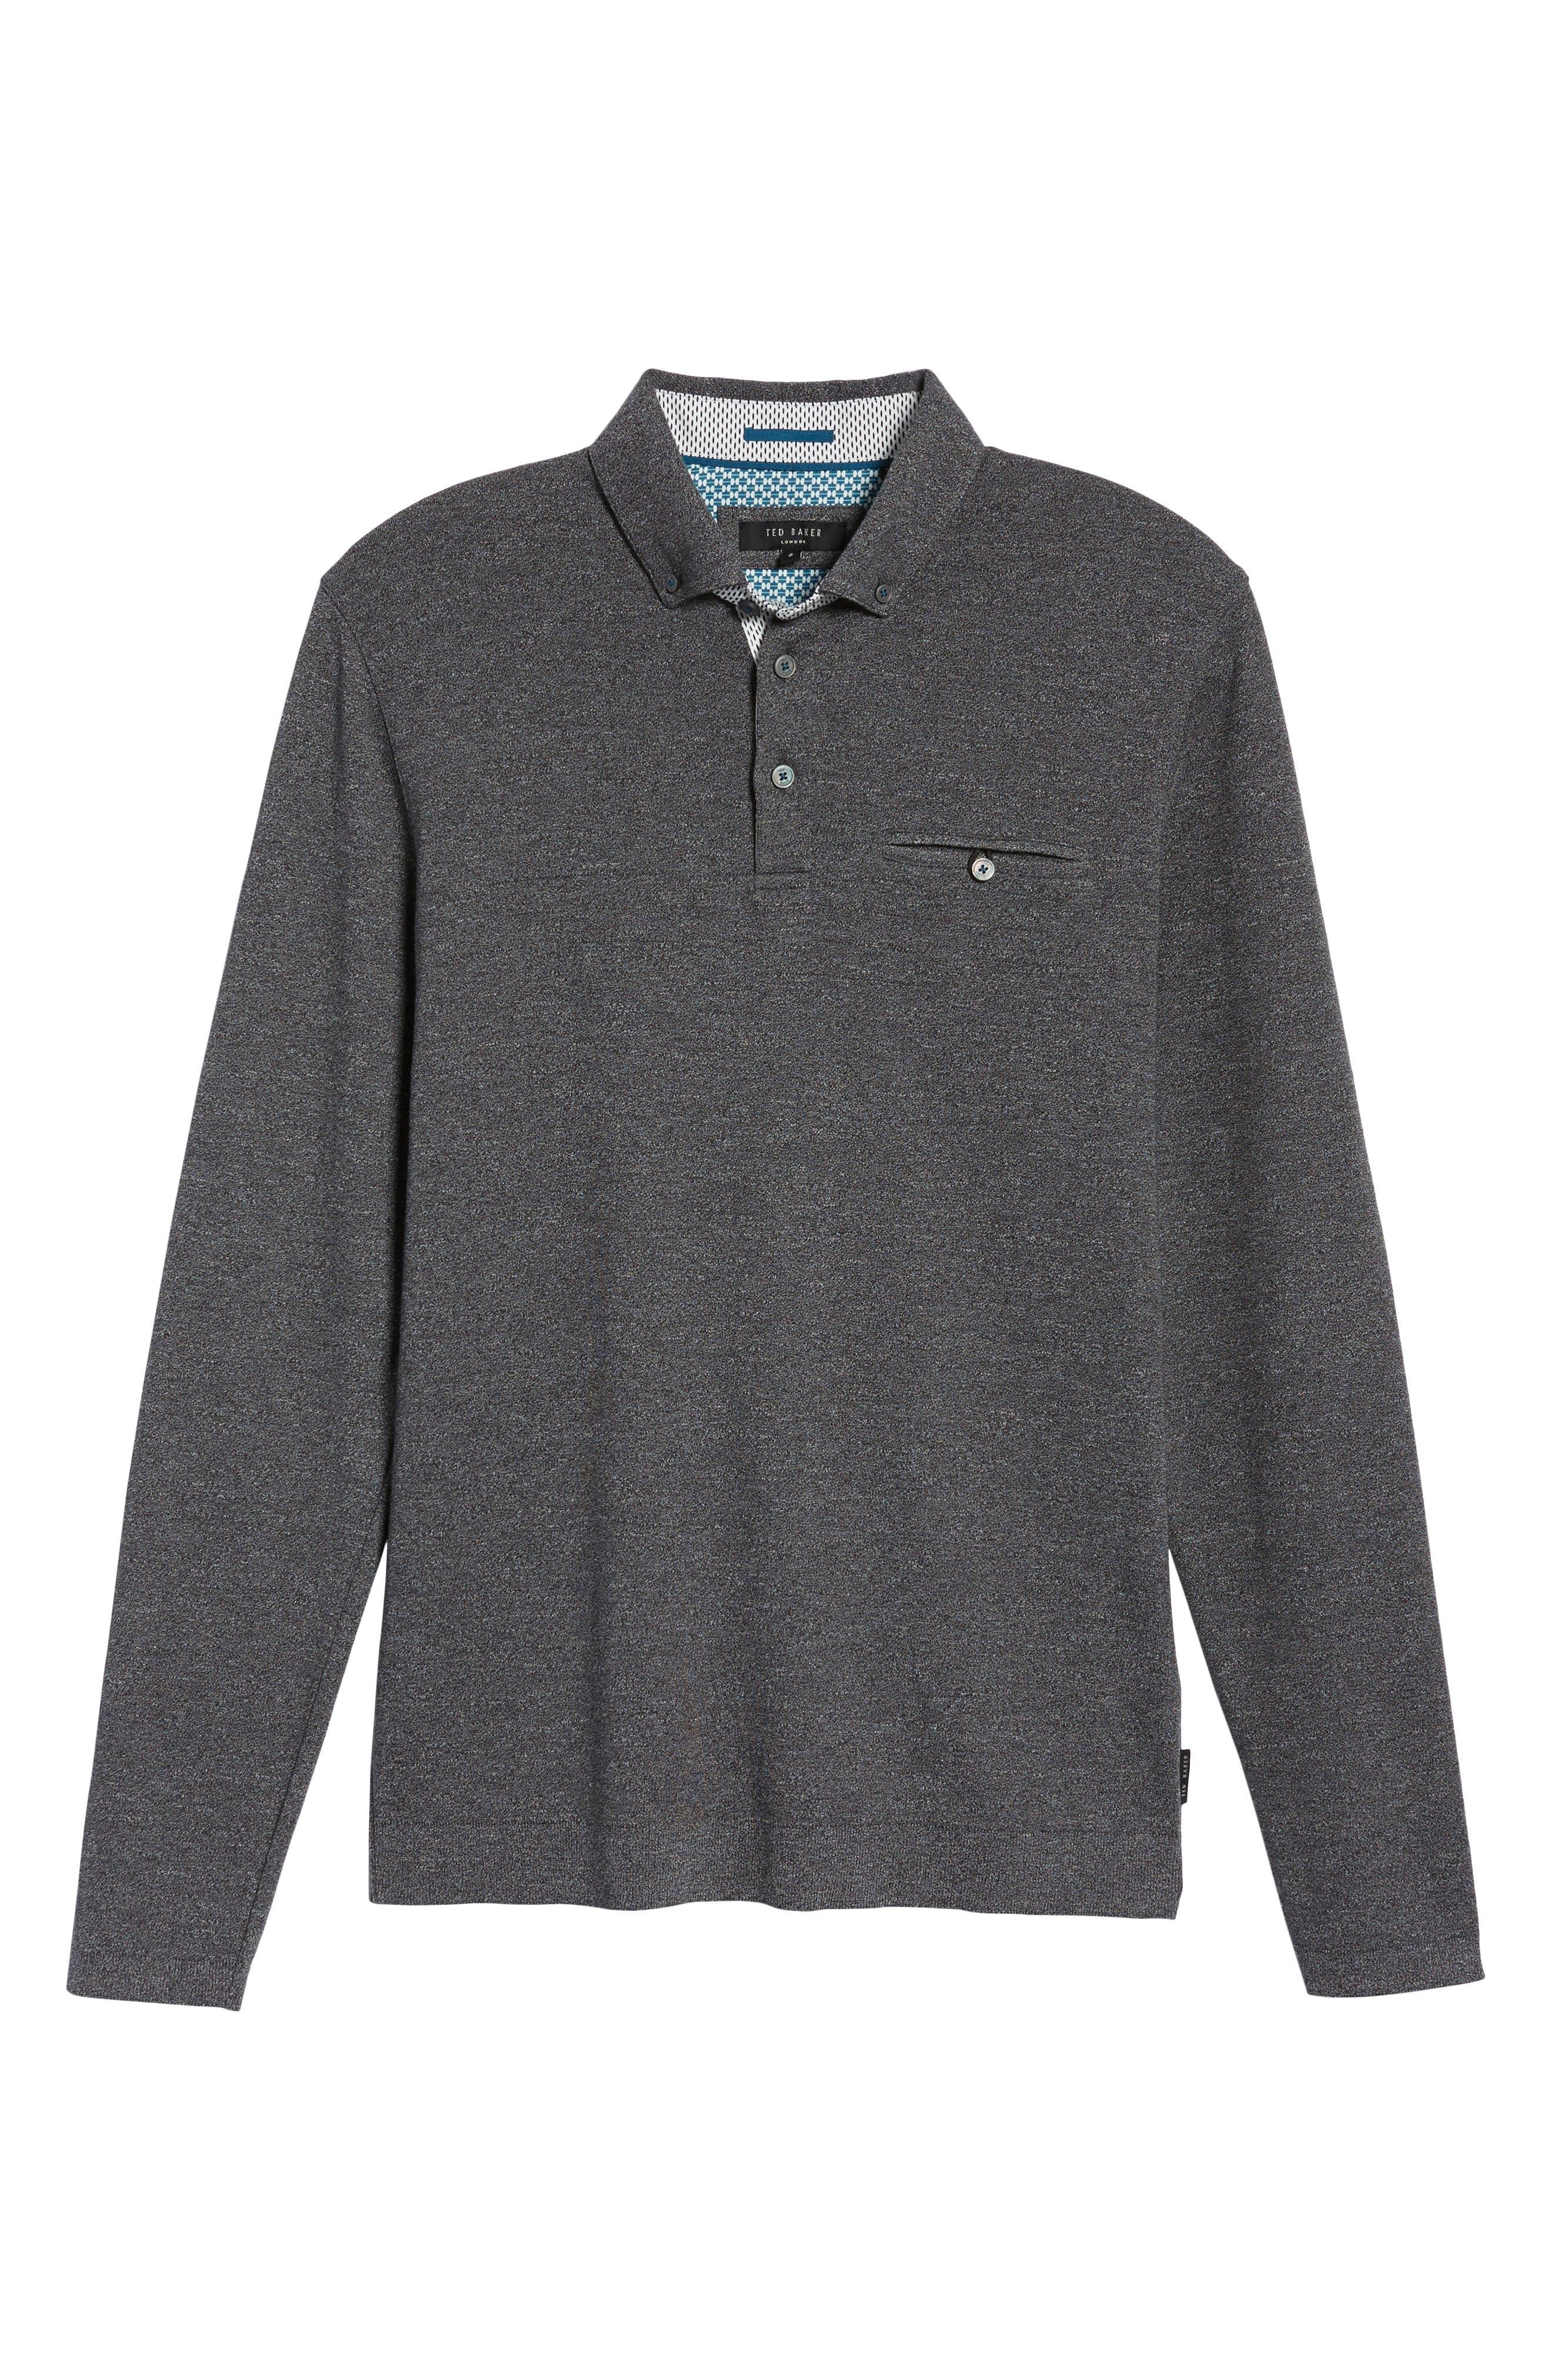 Yamway Modern Slim Fit Long Sleeve Polo,                             Alternate thumbnail 6, color,                             Black